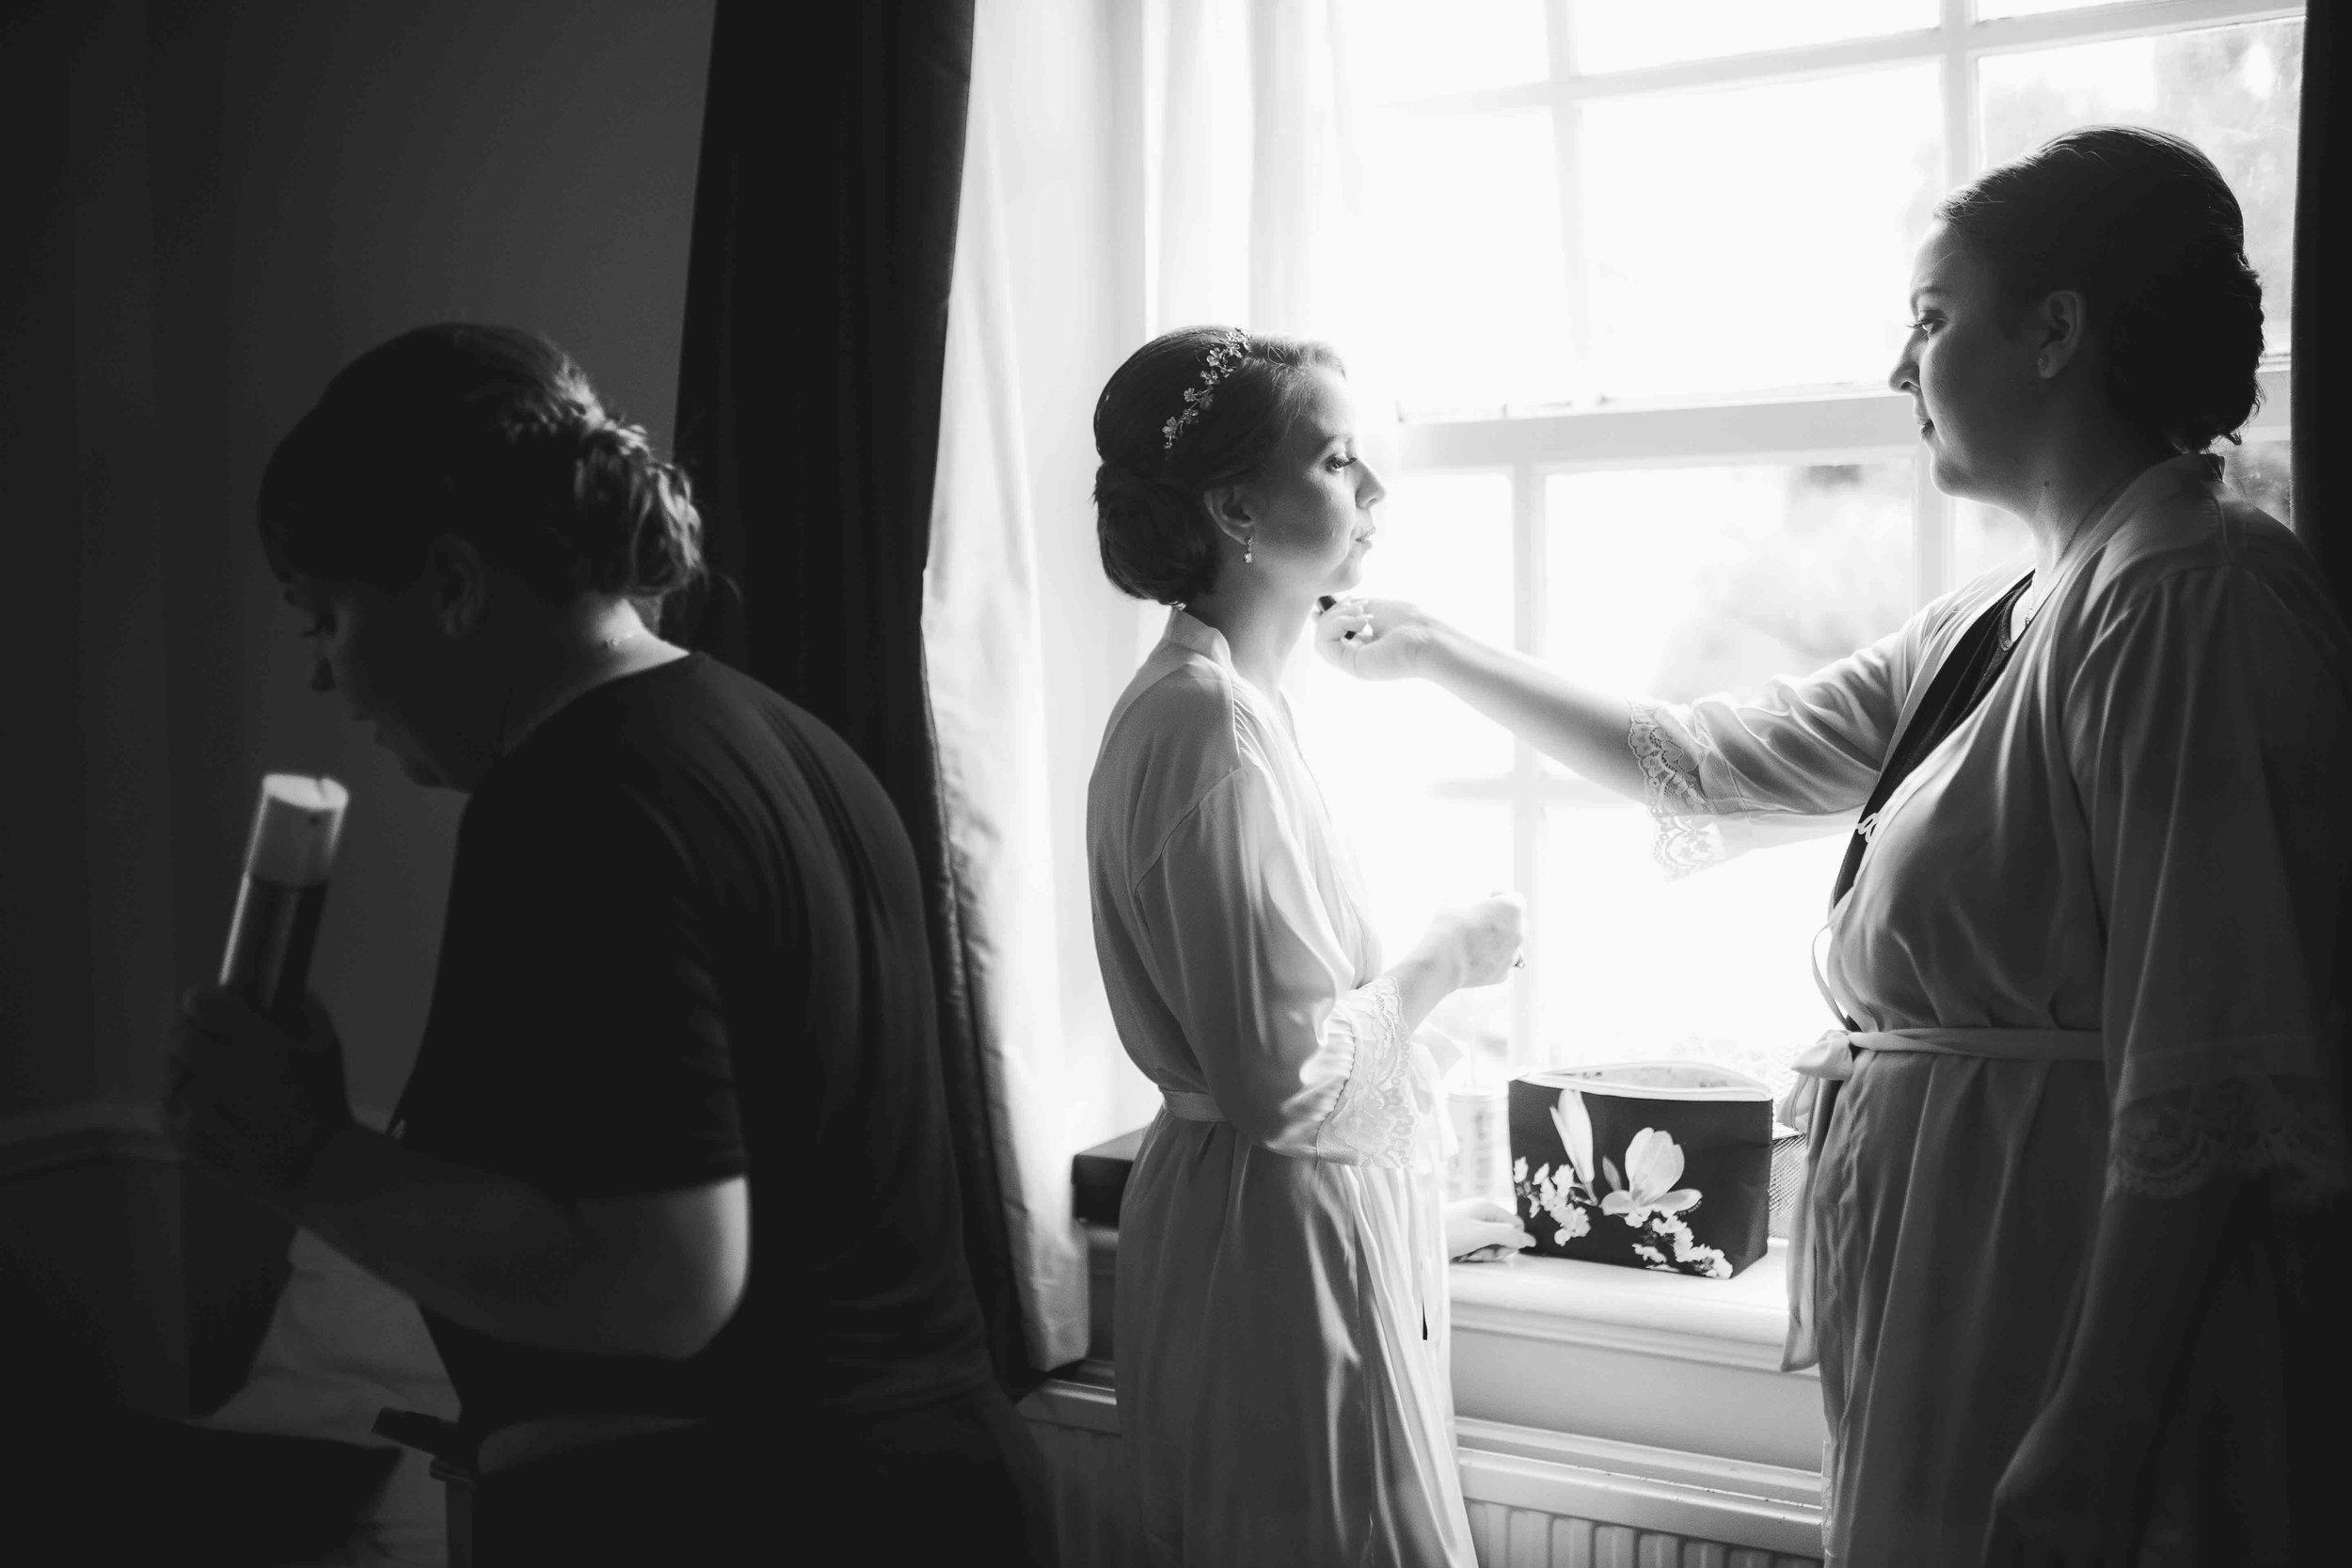 Lea-cooper-photography-willenhall-wolverhampton-wedding-photographer-birmingham-shirley-west-midlands-ceremony-church-1.JPG